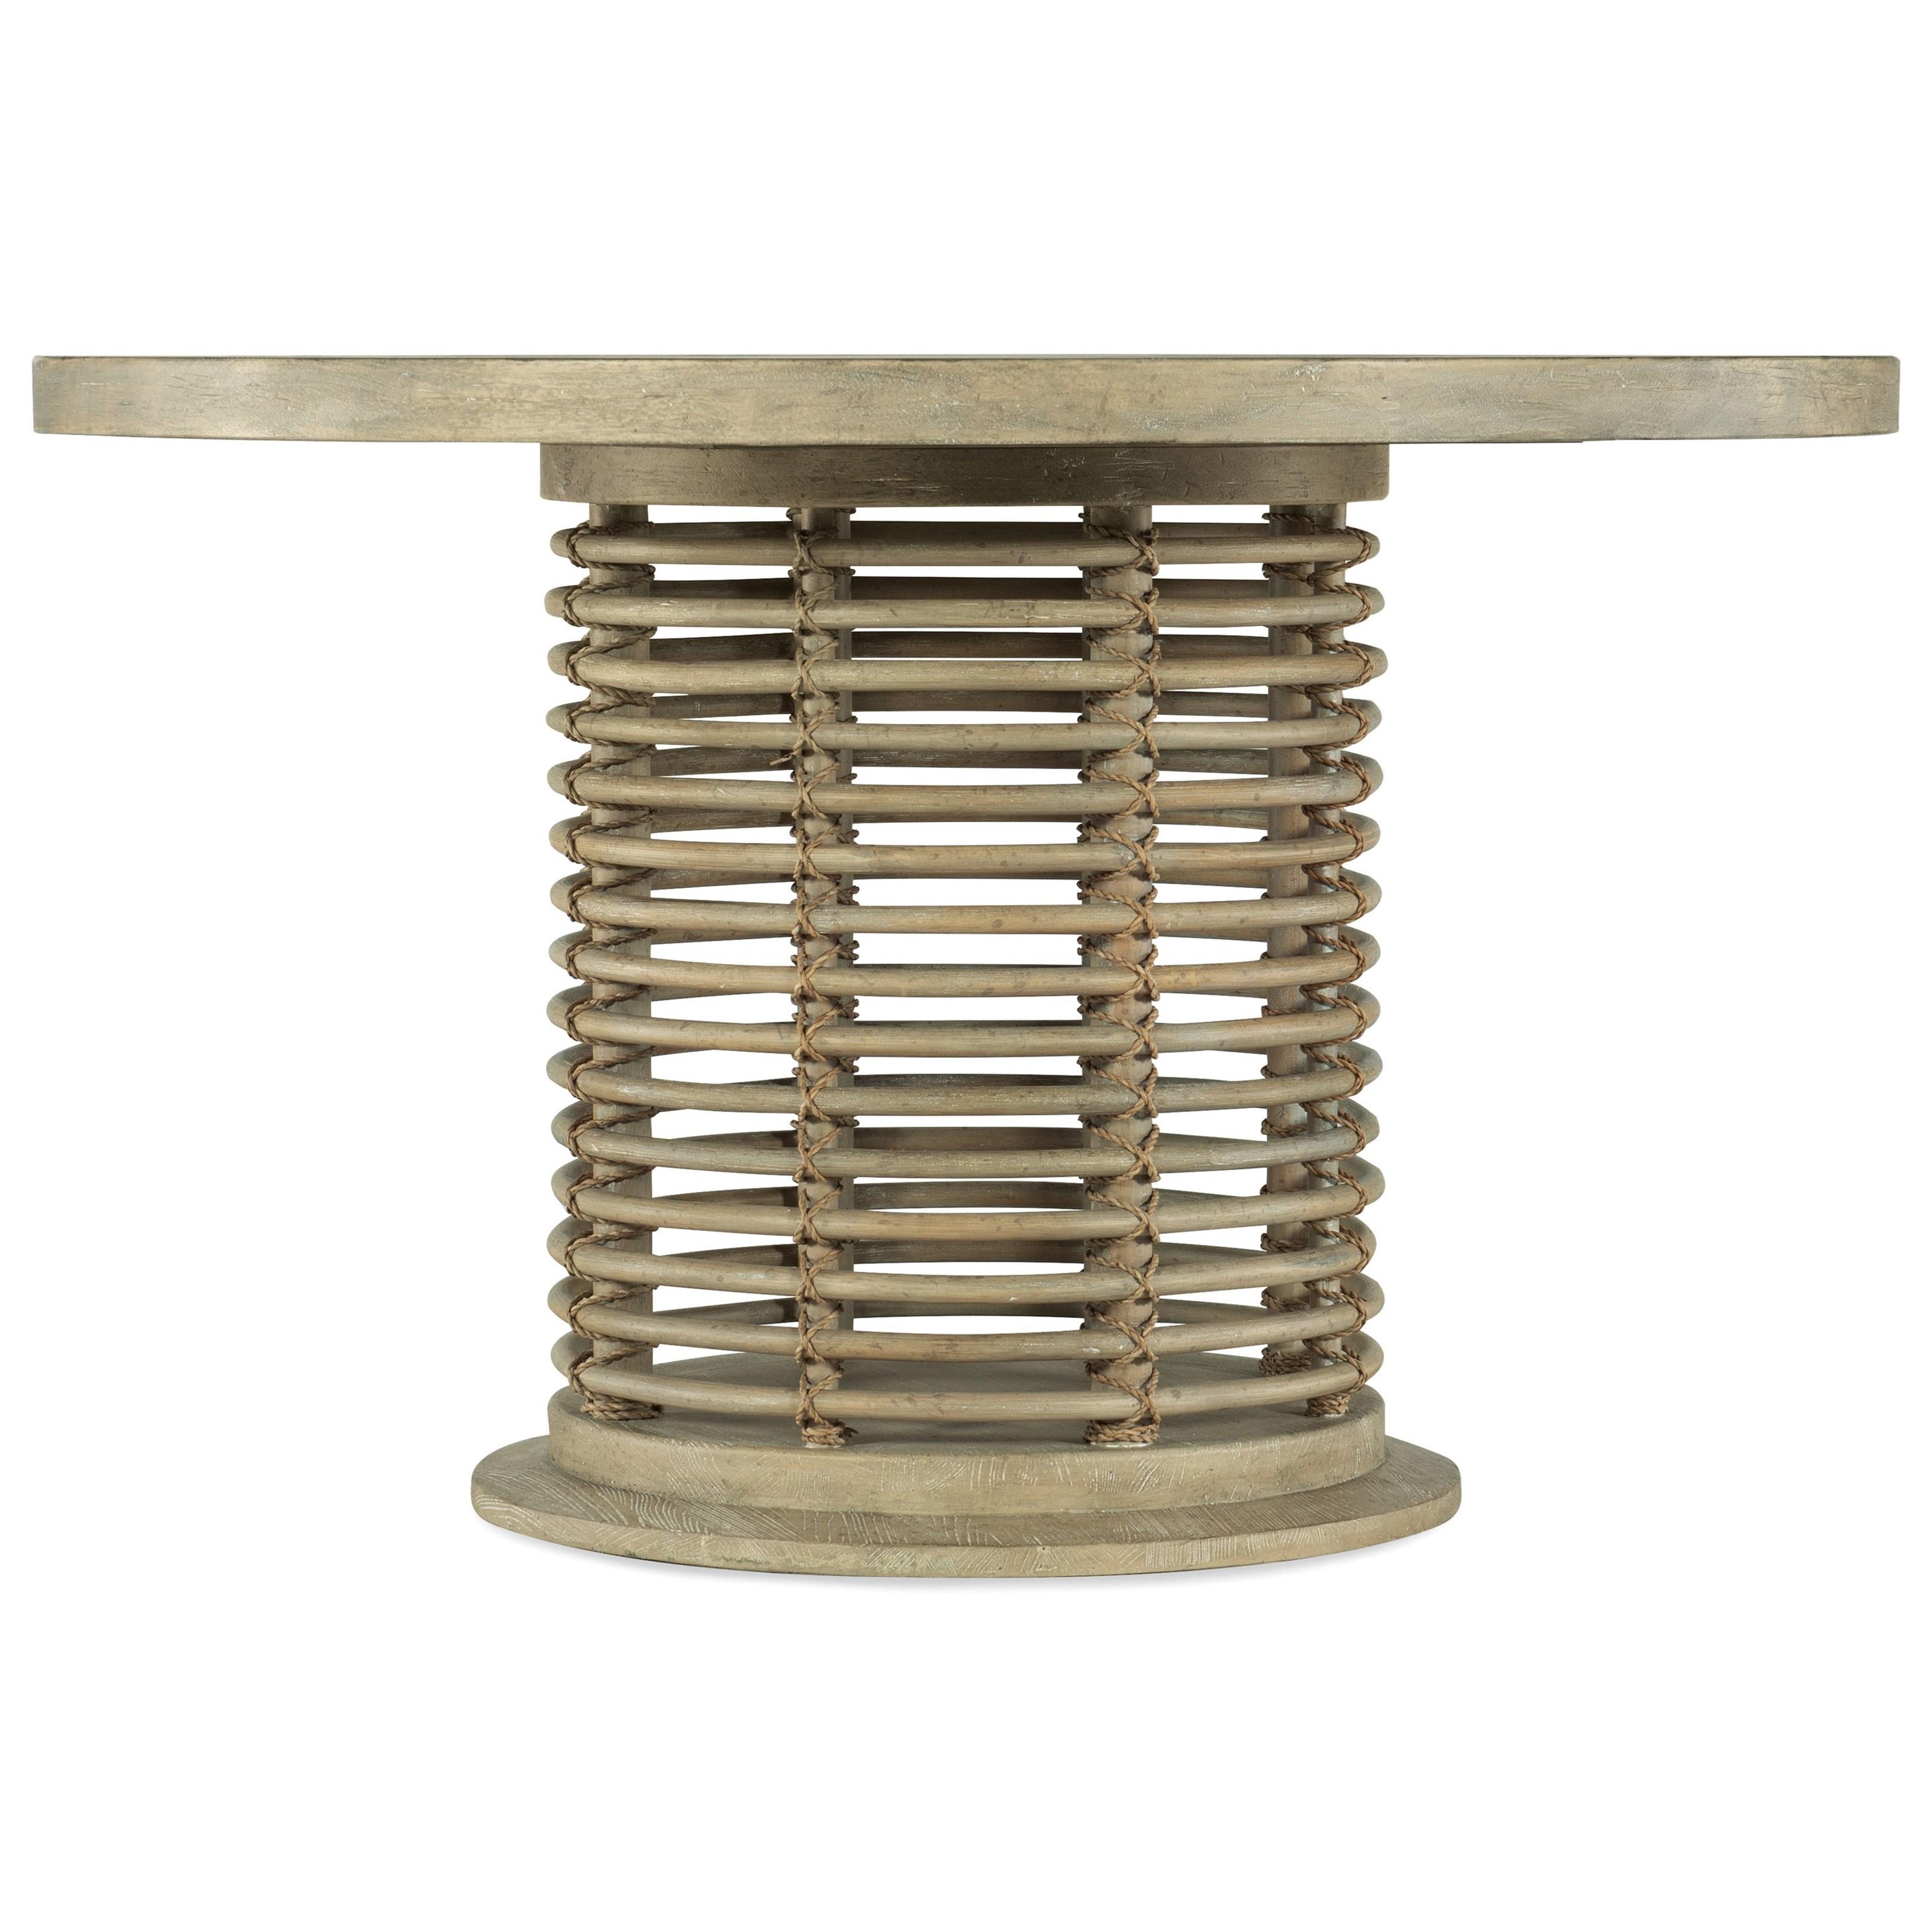 Coastal Rattan Round Dining Table